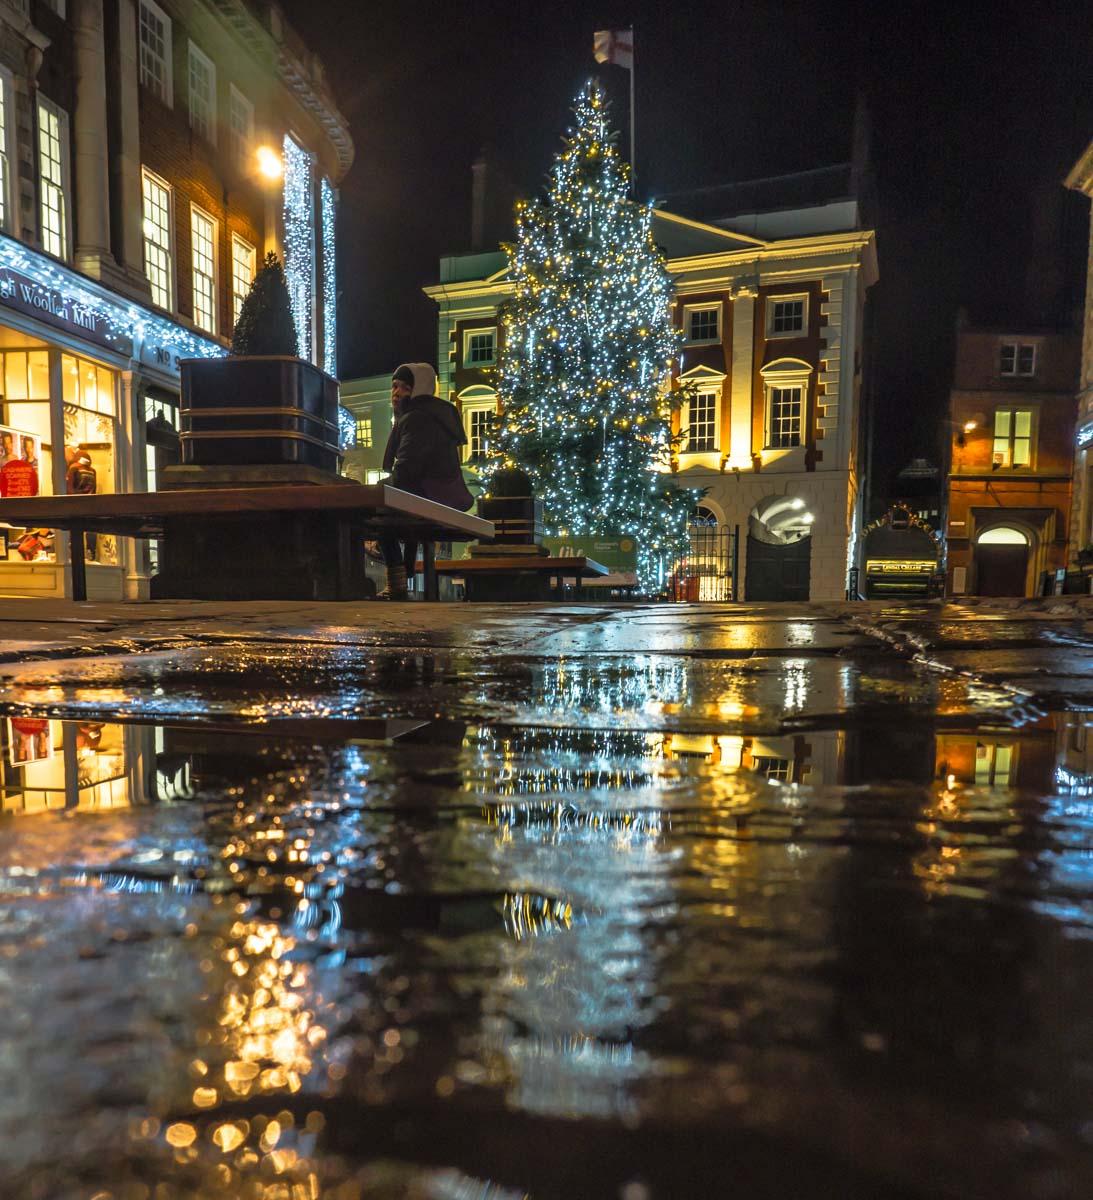 night-photography-York-11 A Christmas Evening Walk Around York